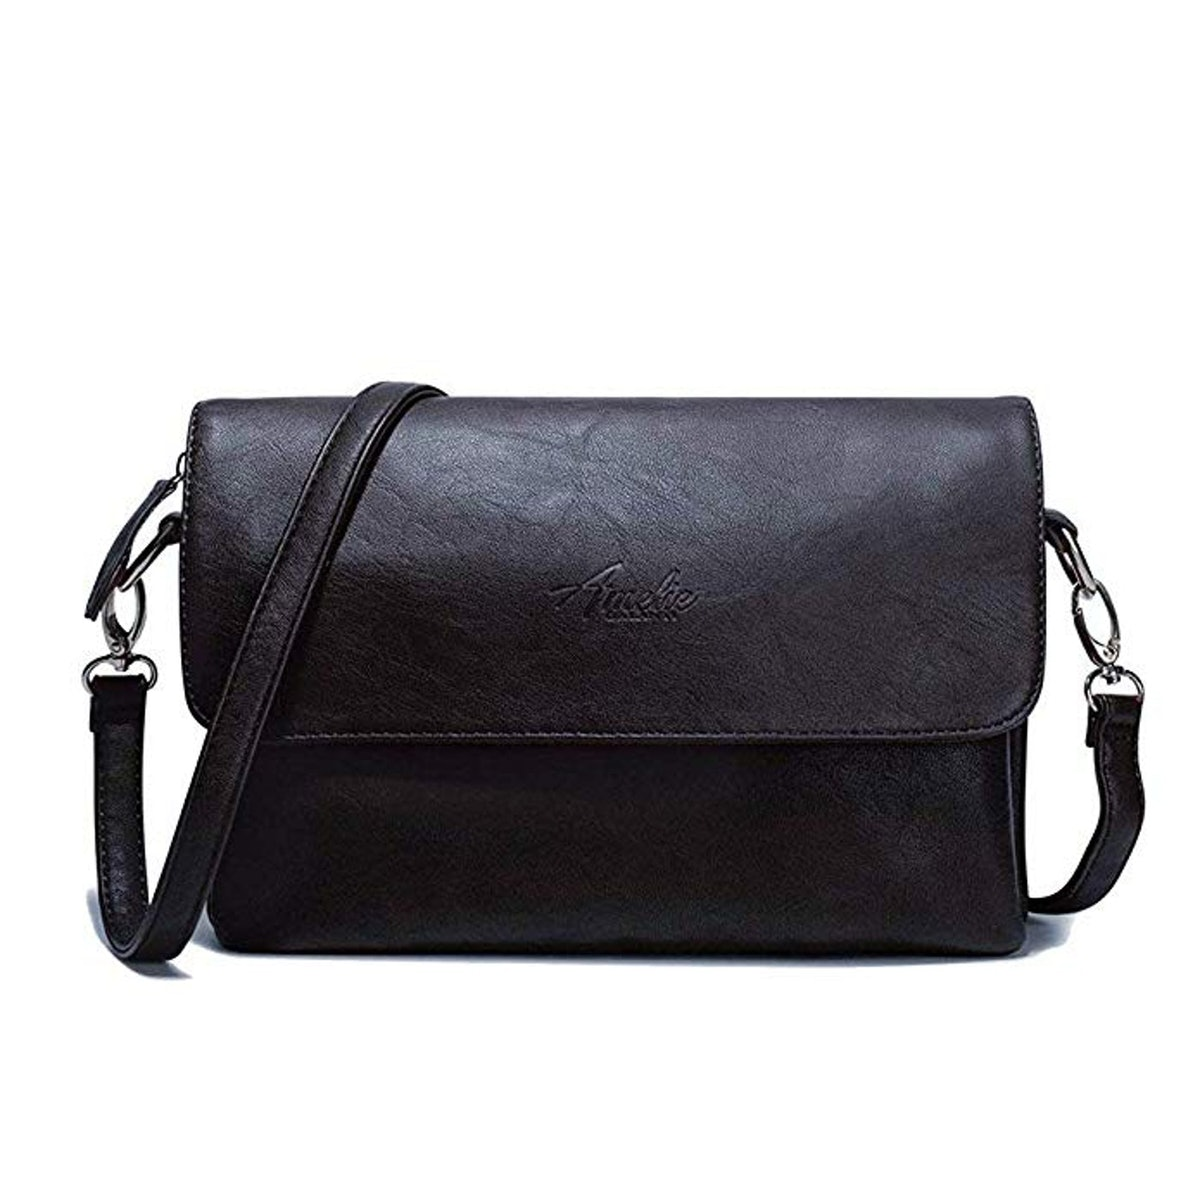 Amelie Galanti PU Leather Crossbody Bag